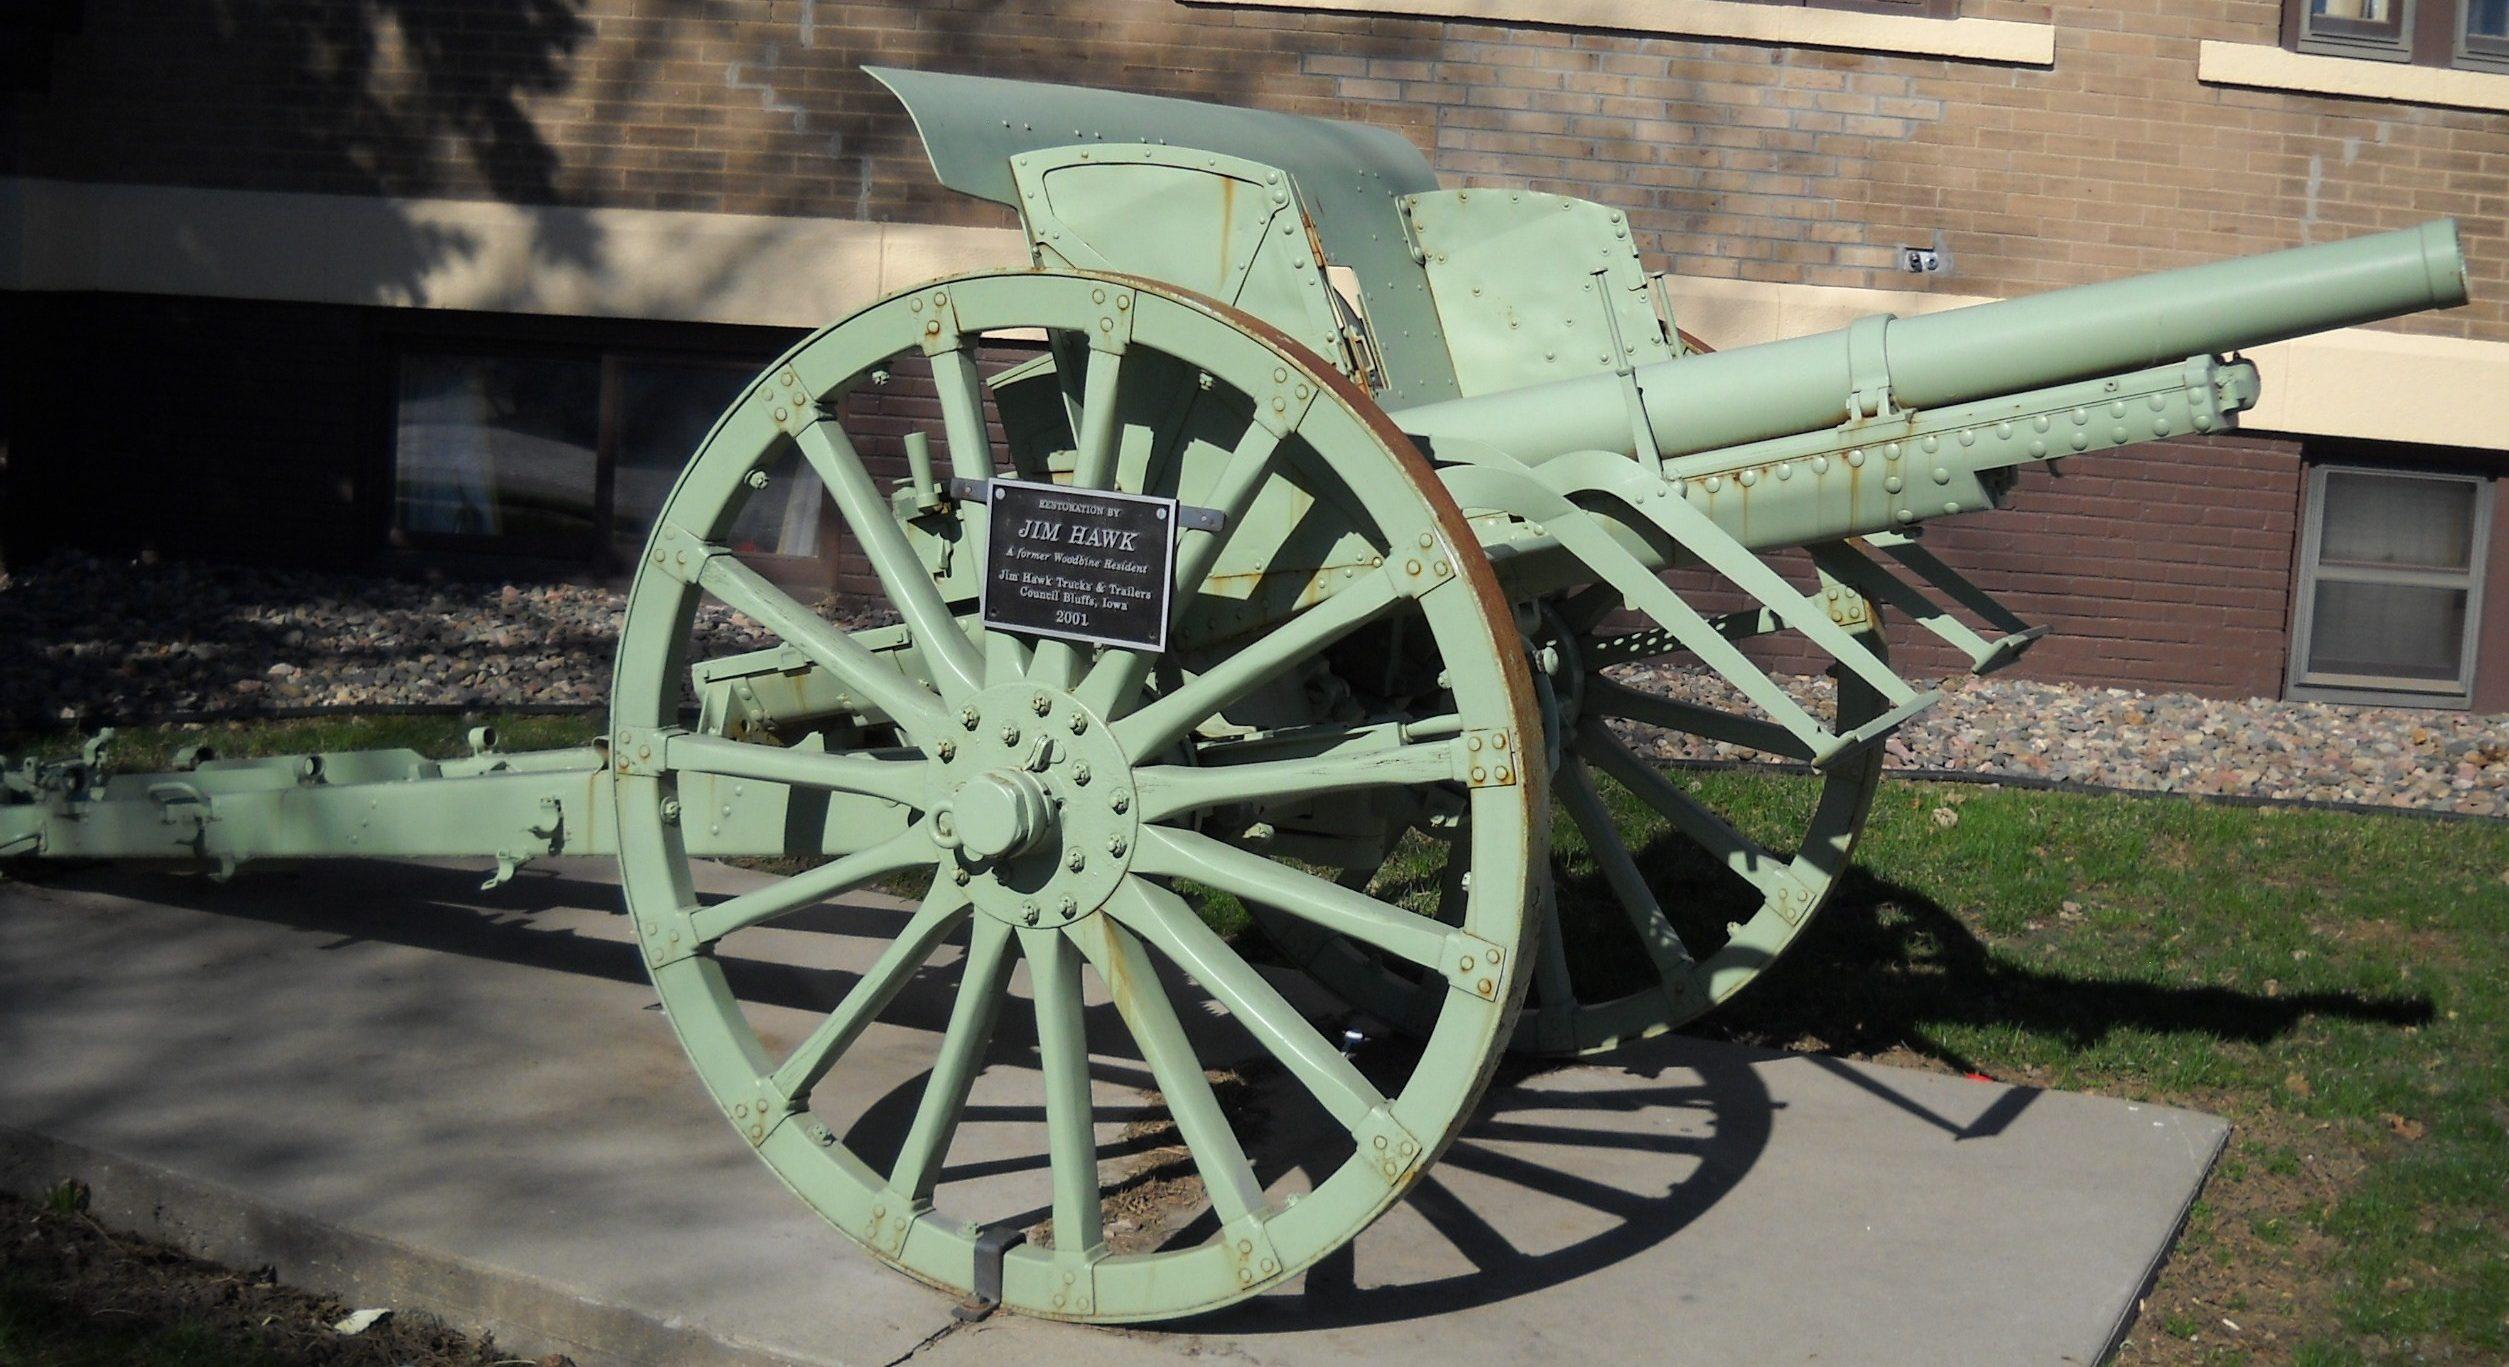 75-мм горная  пушка   Туре-35  образца  1902 г.